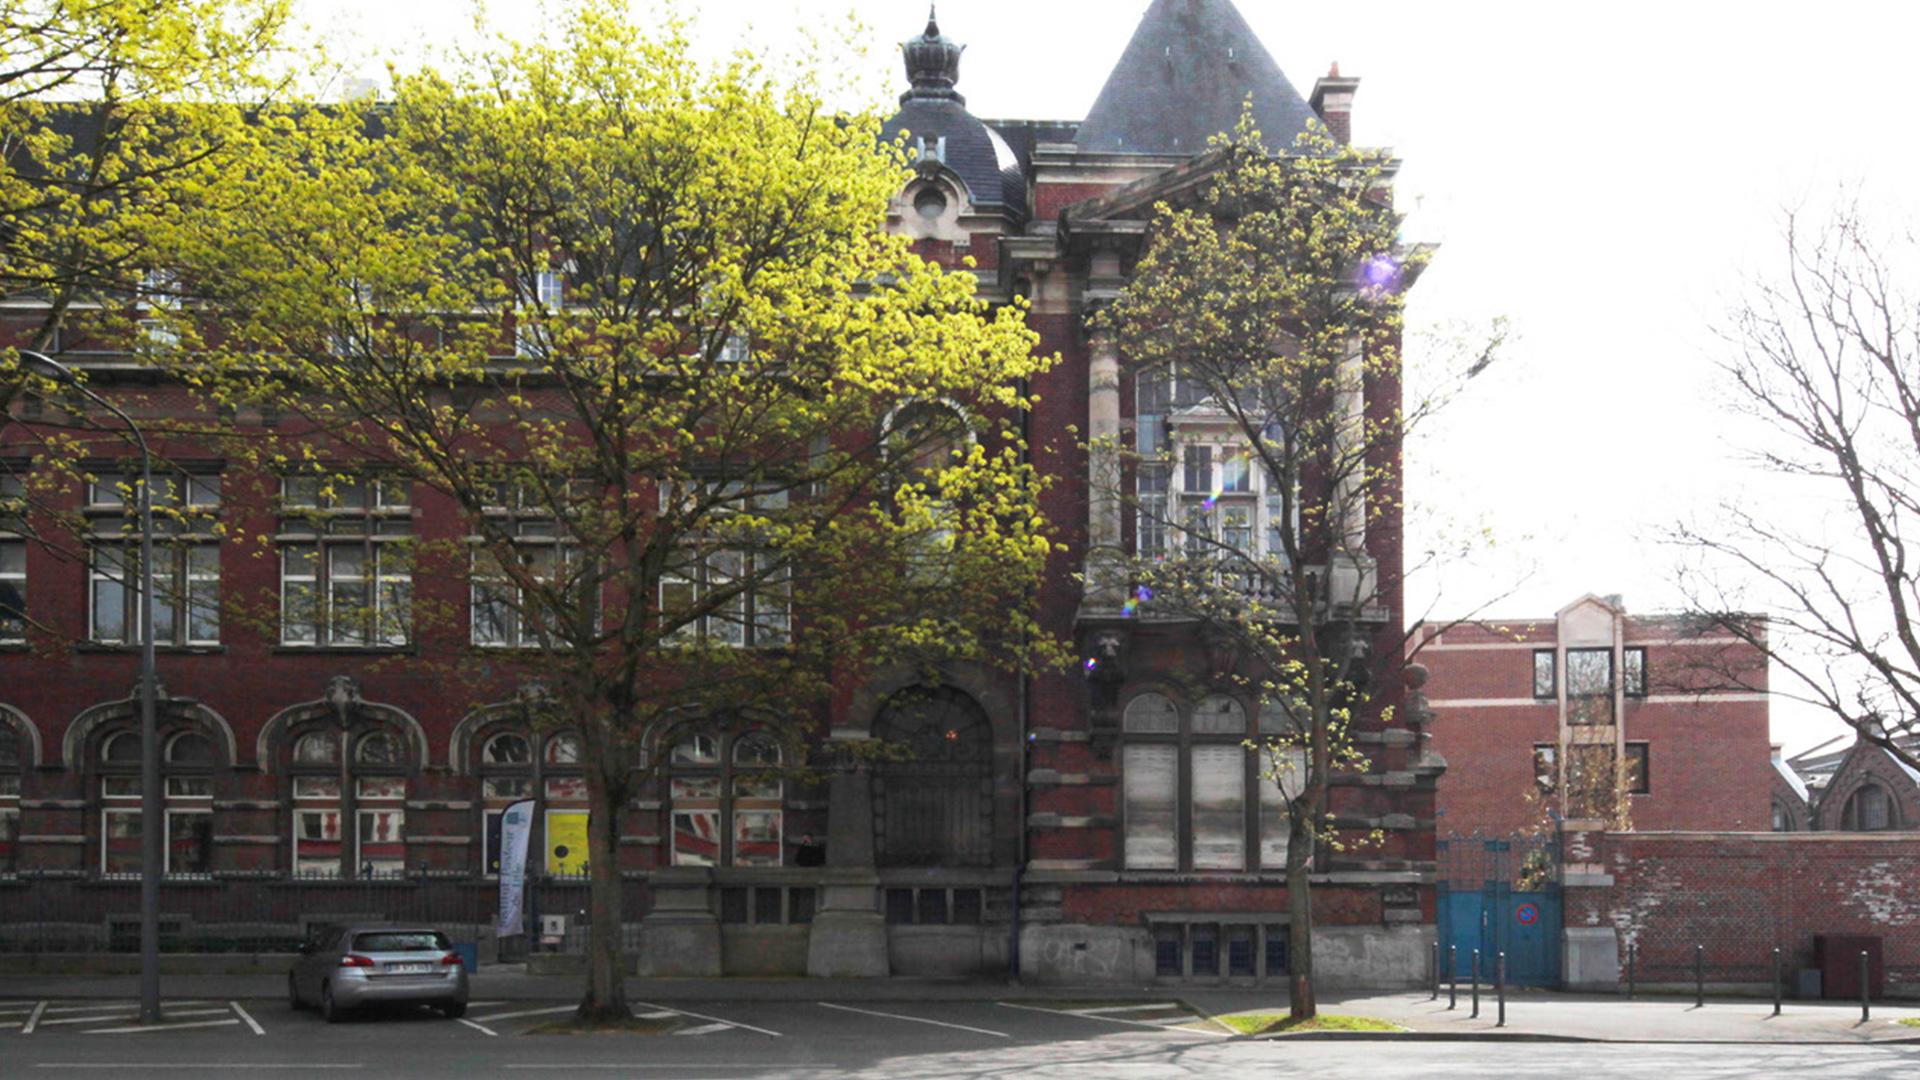 Institut Pasteur de Lille